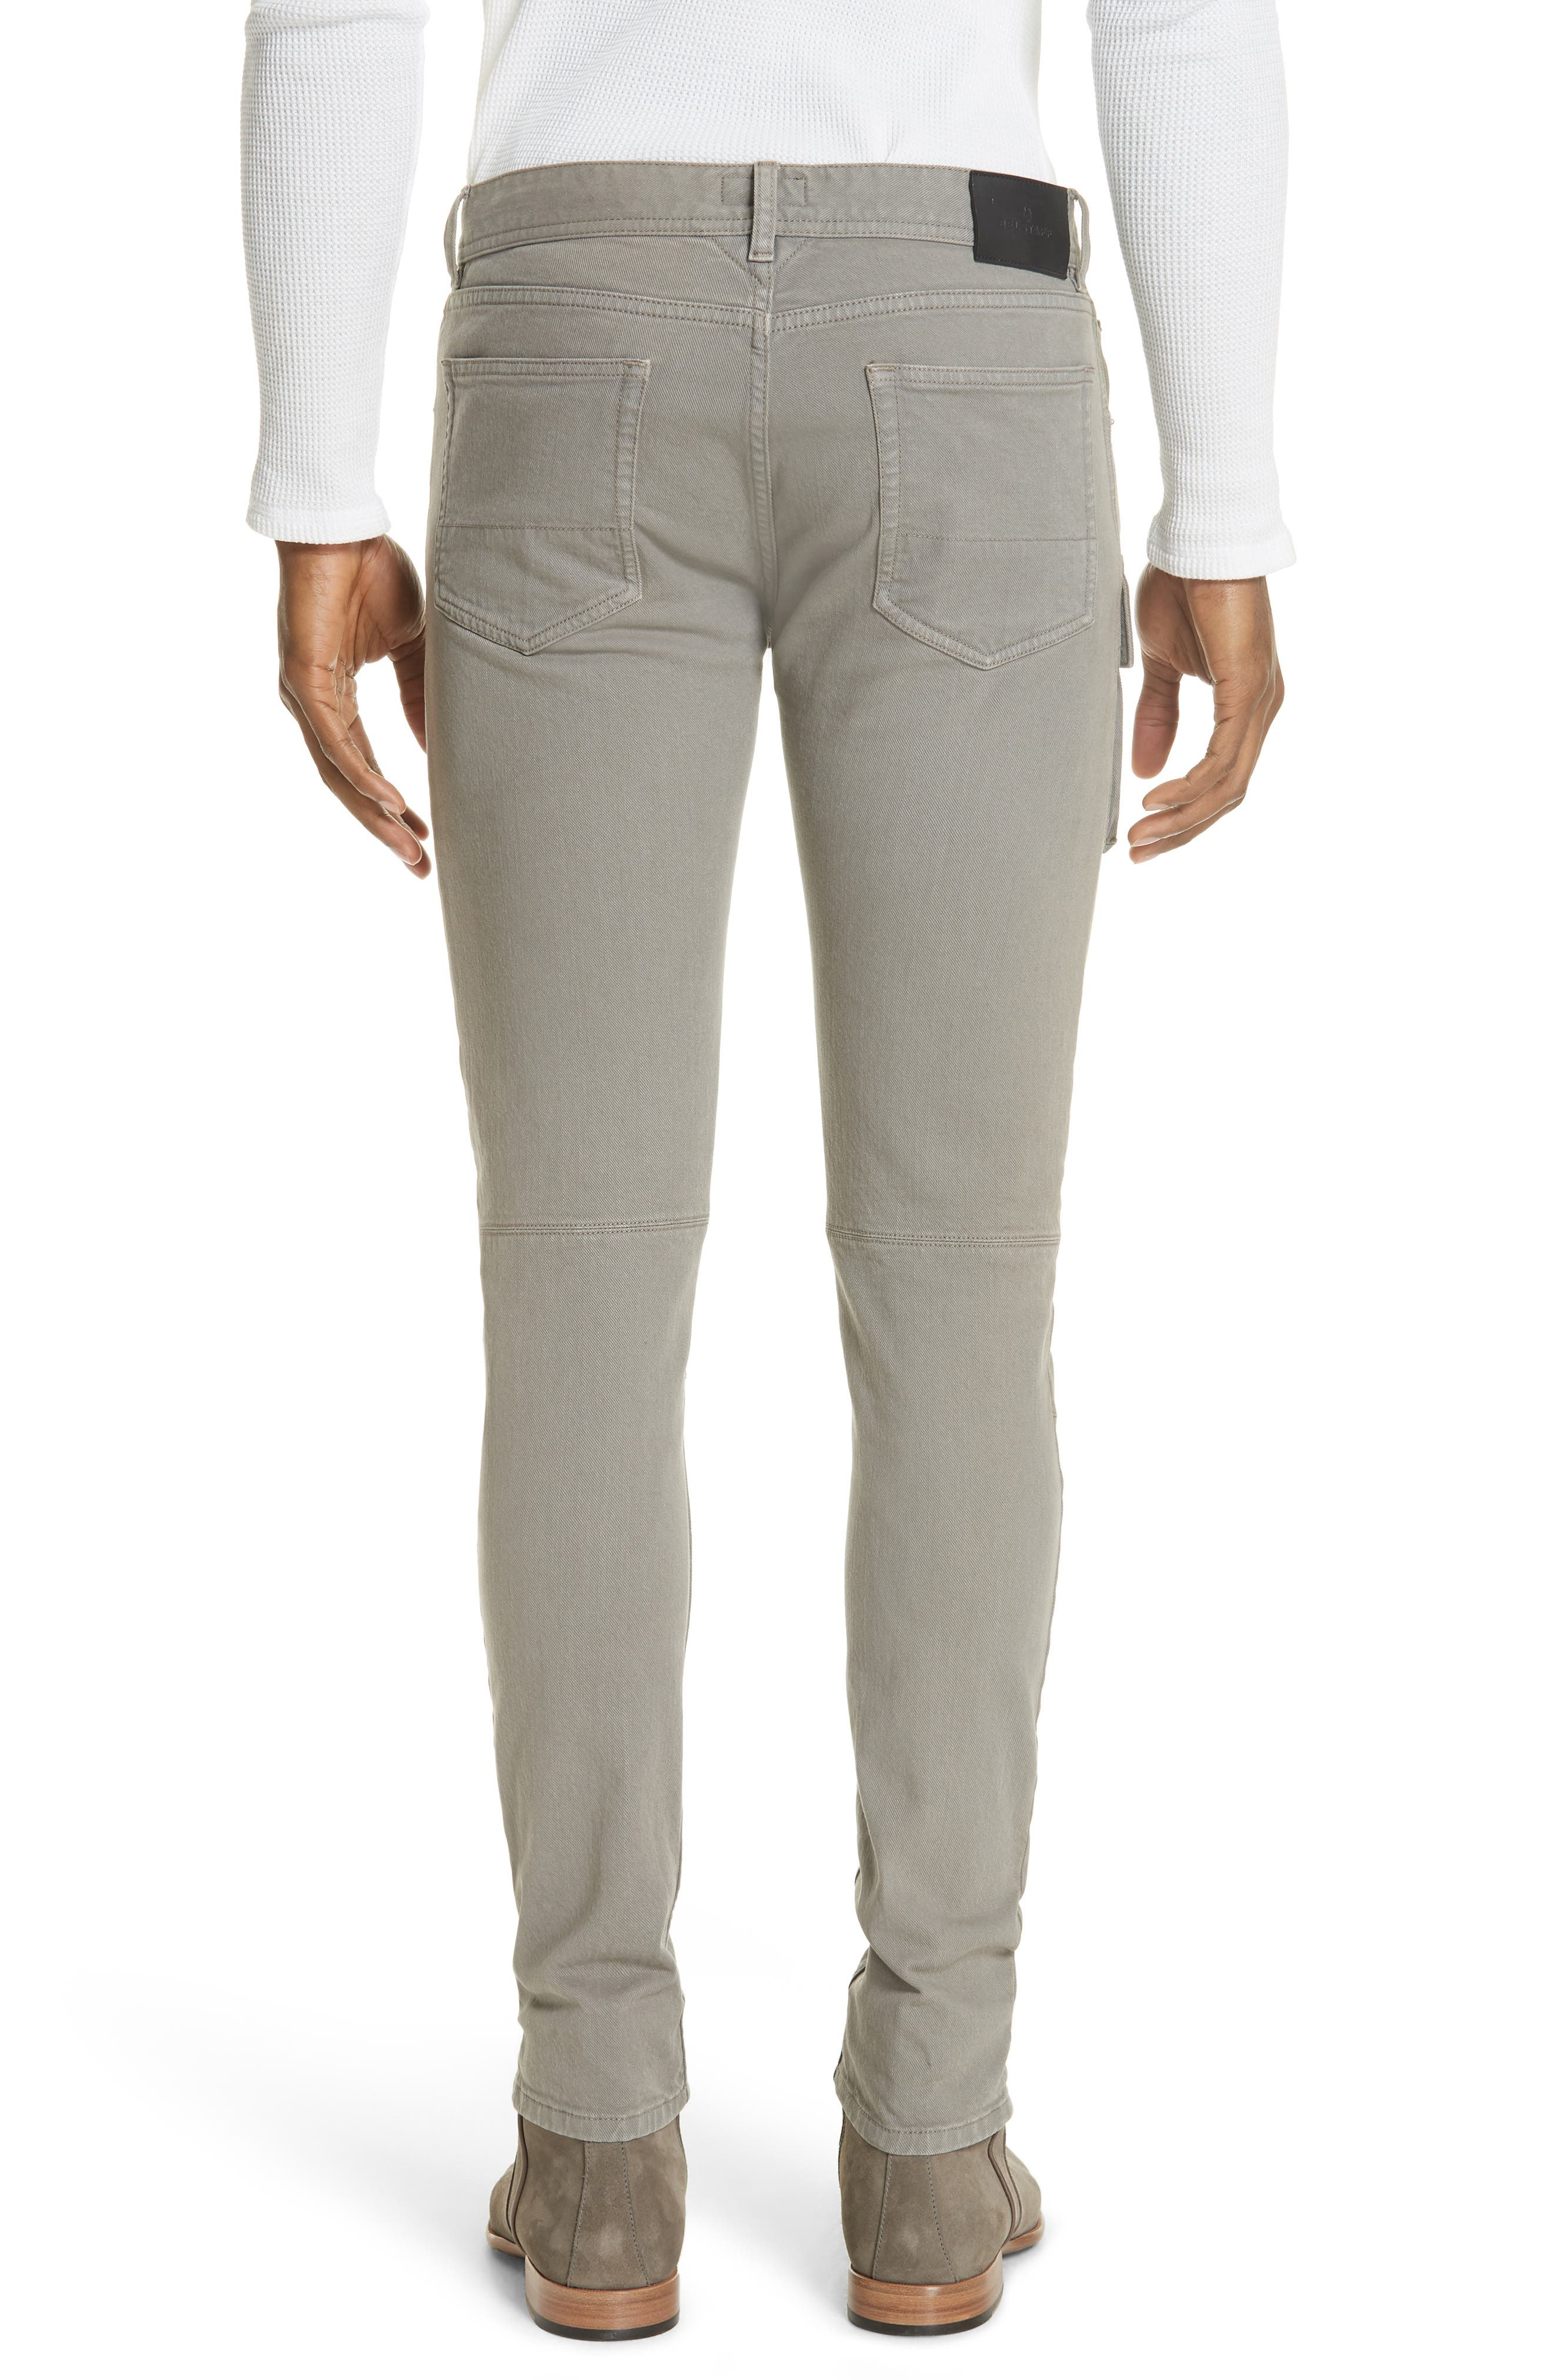 Polmont Cargo Denim Jeans,                             Alternate thumbnail 2, color,                             SMOKE GREY